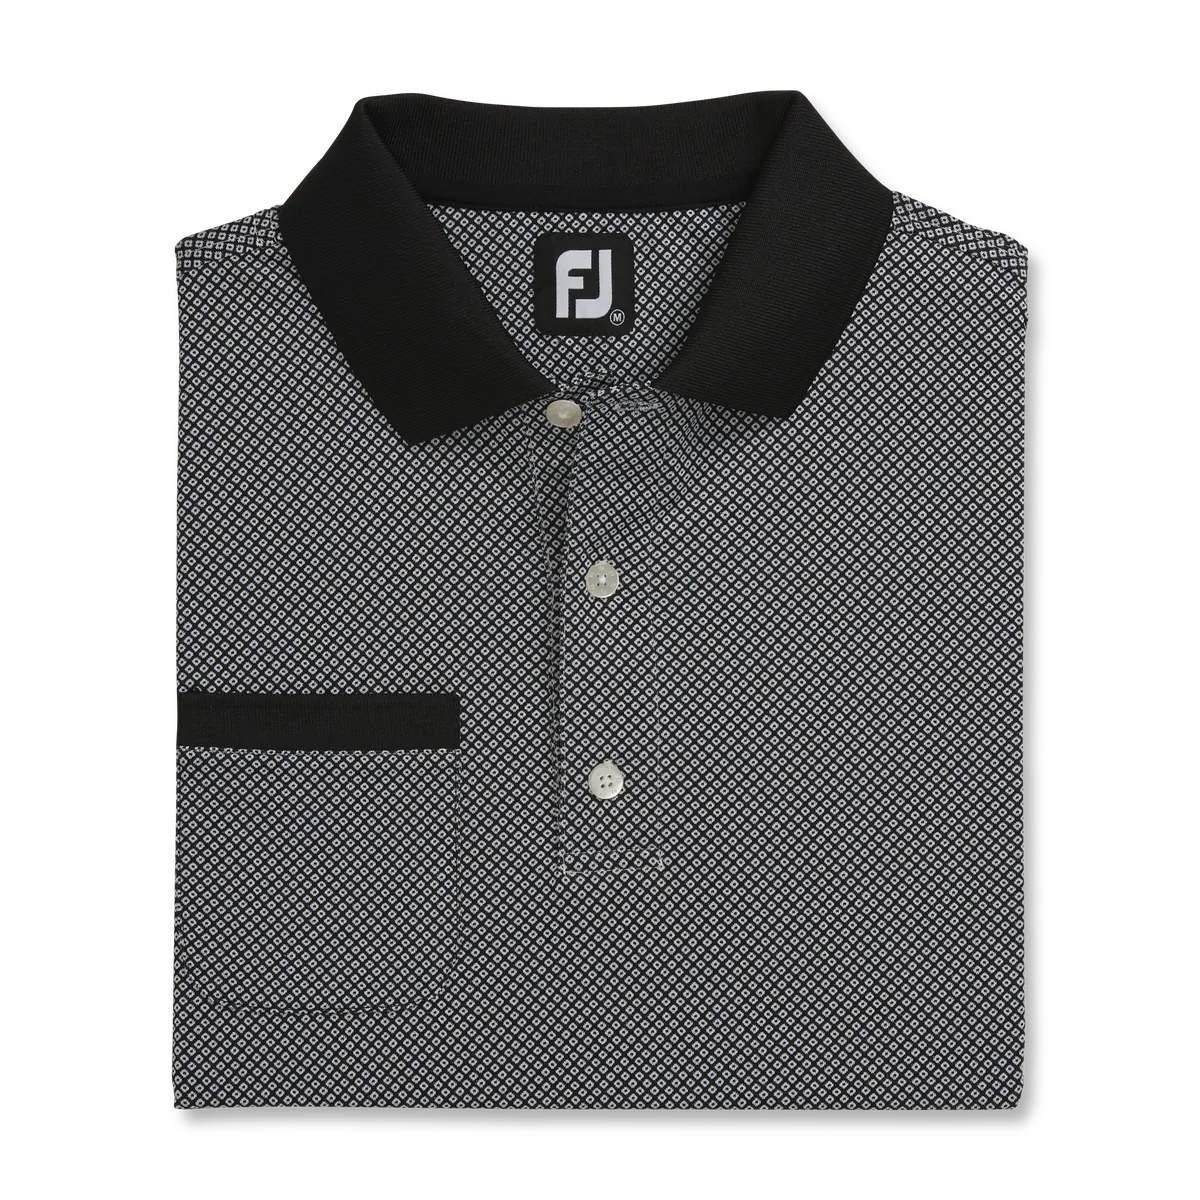 FootJoy Men's Diamond Jacquard Black Polo